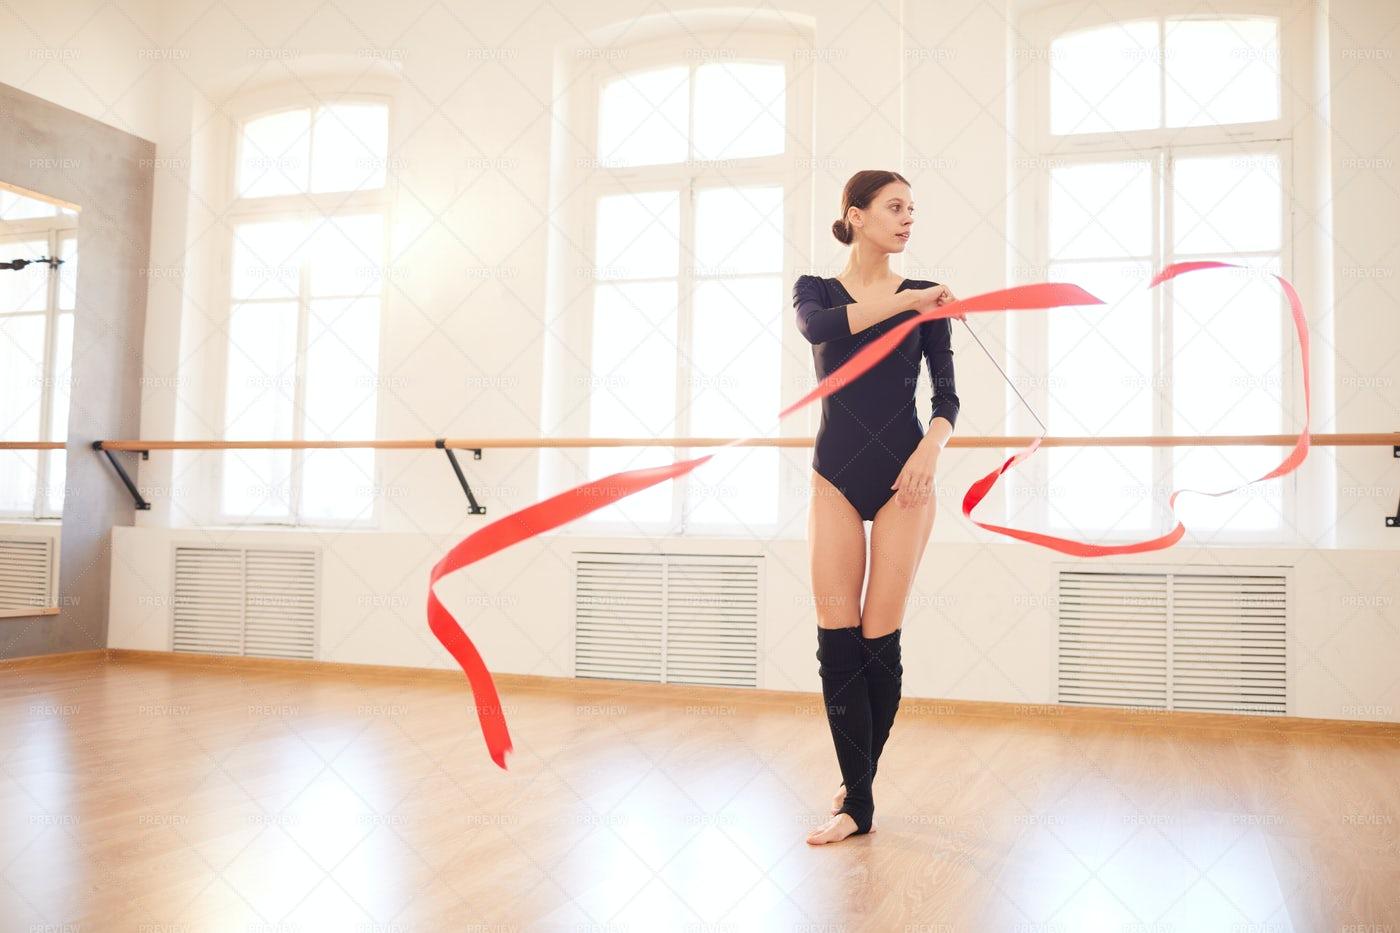 Gymnast Dancing With Ribbon: Stock Photos